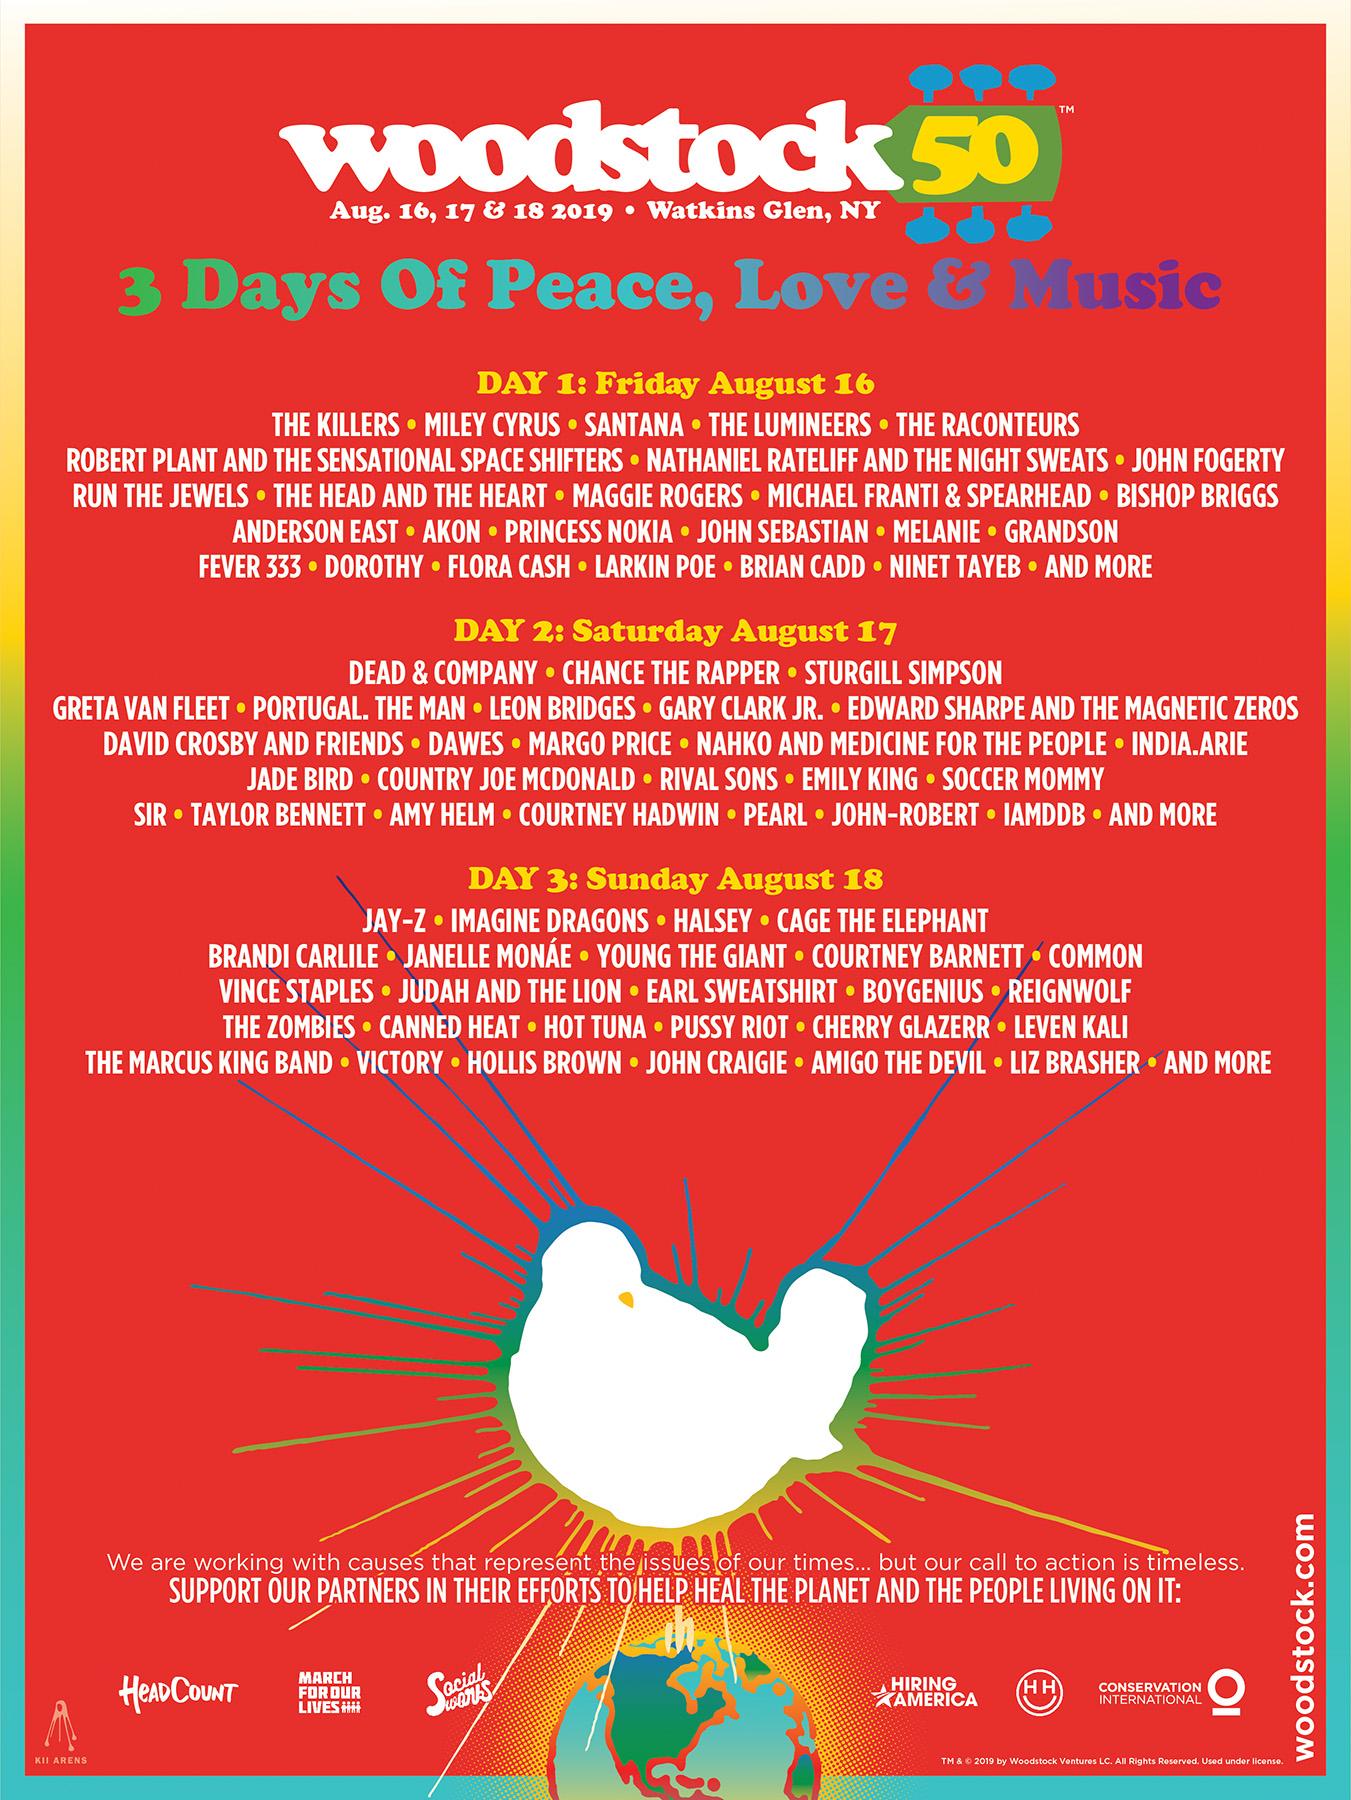 lineup_poster_18x24 (1).jpg